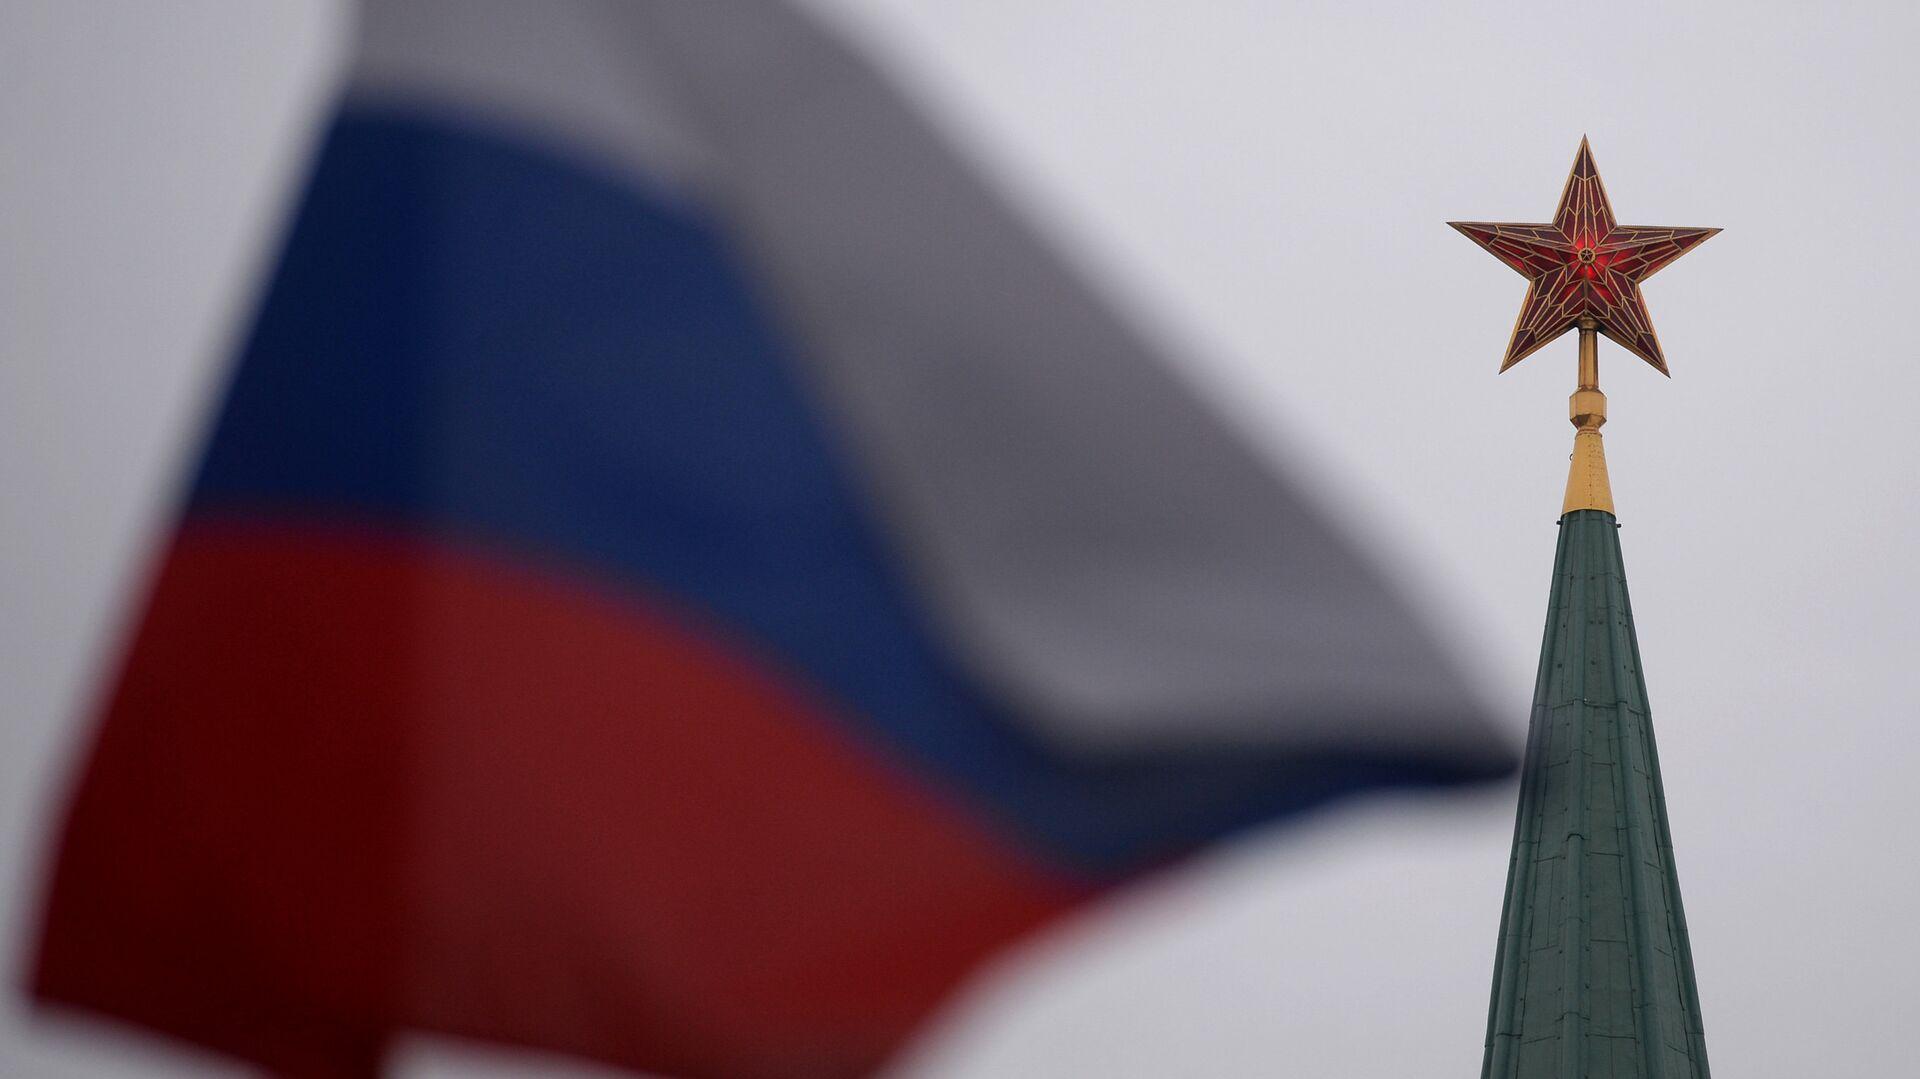 Bandera de Rusia en la Plaza Roja en Moscú - Sputnik Mundo, 1920, 16.02.2021